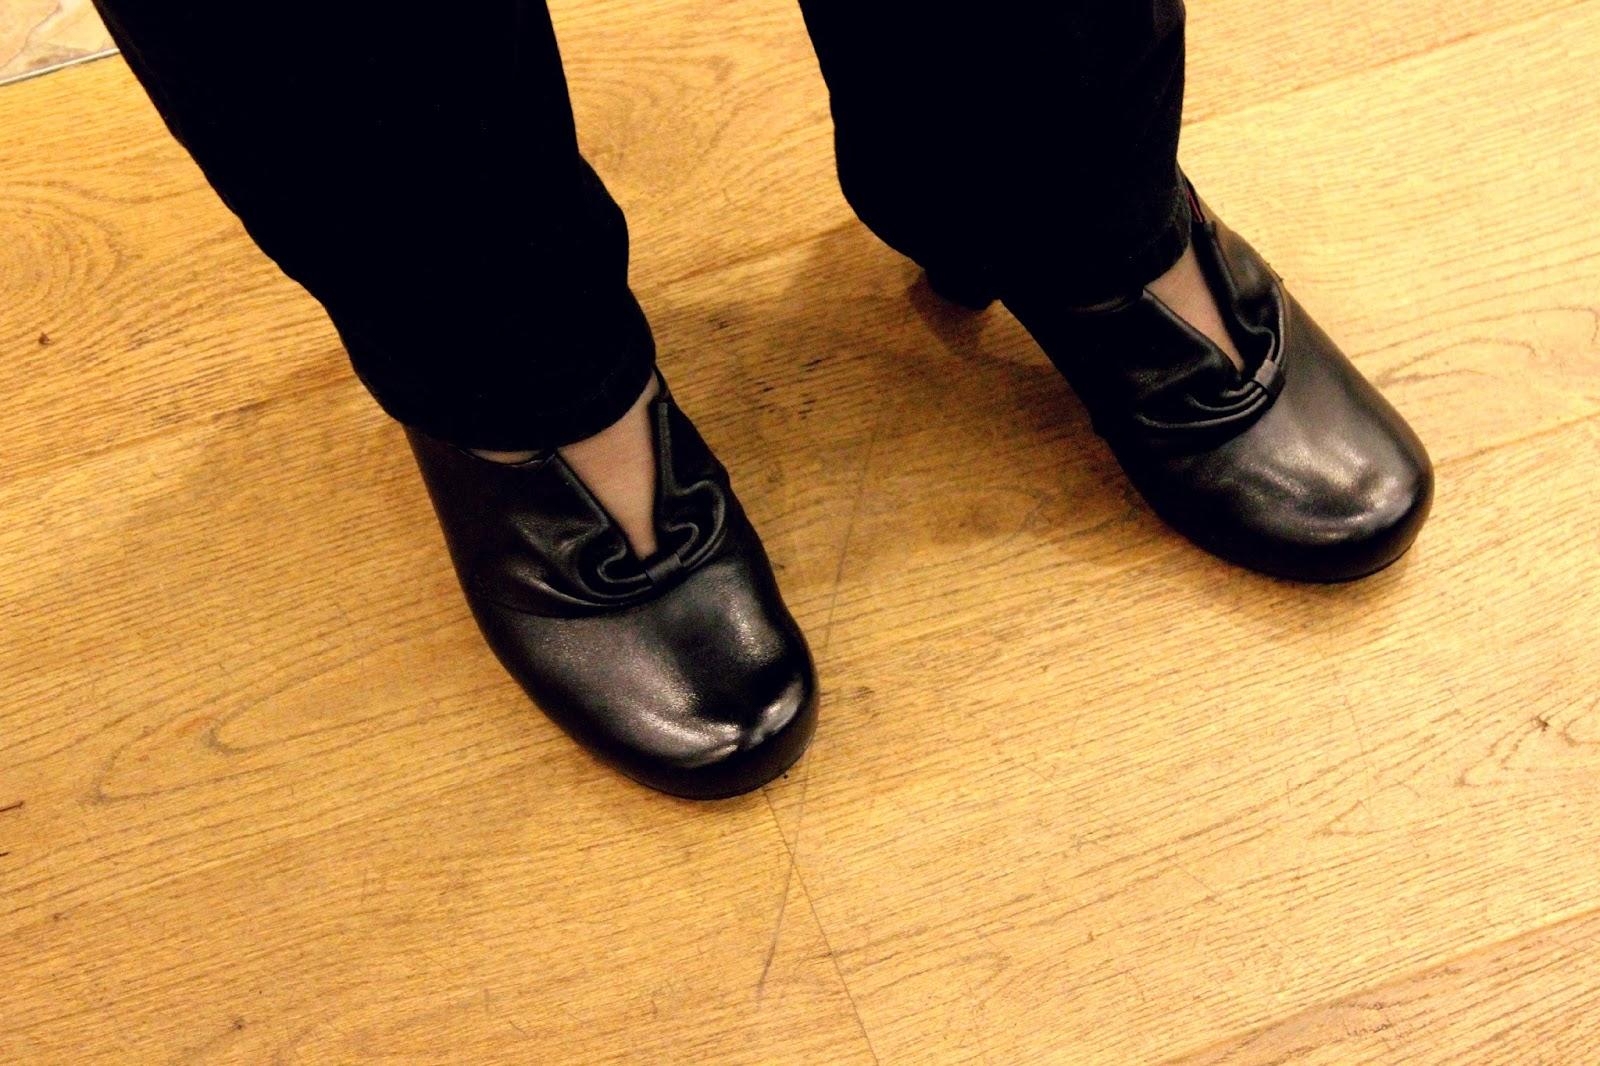 Hotter Shoes 28 Images Forzest 20 Without Prescription